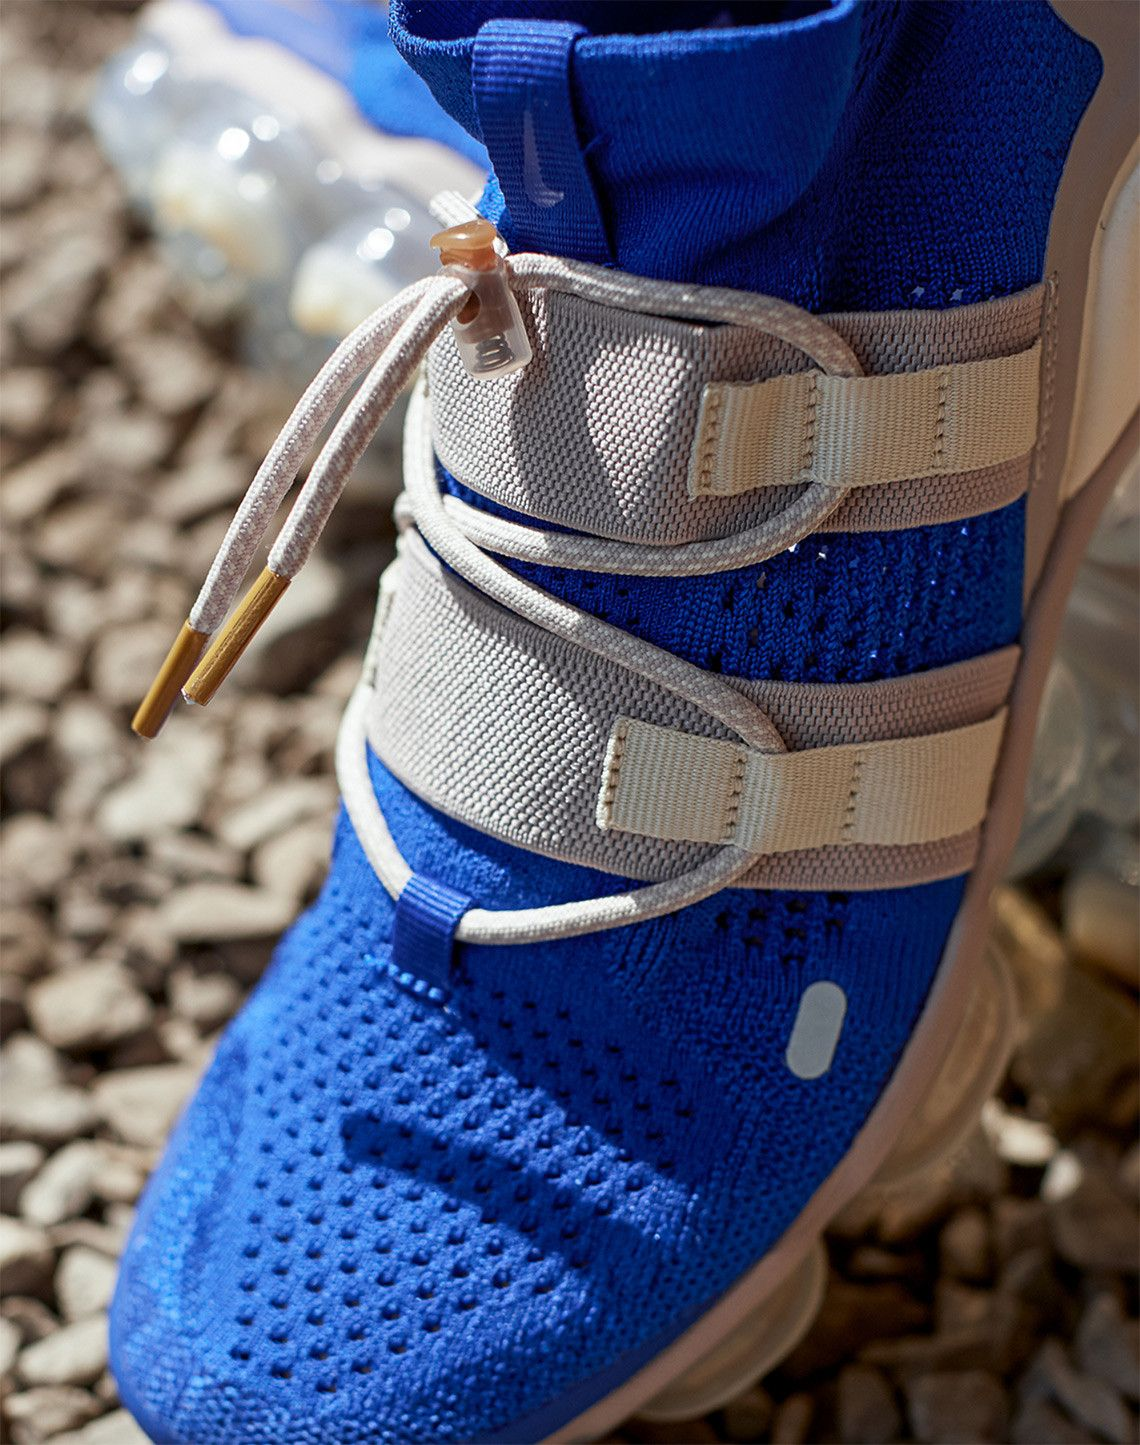 d1e12557766b0 Nike Vapormax Utility Racer Blue Is Coming Soon